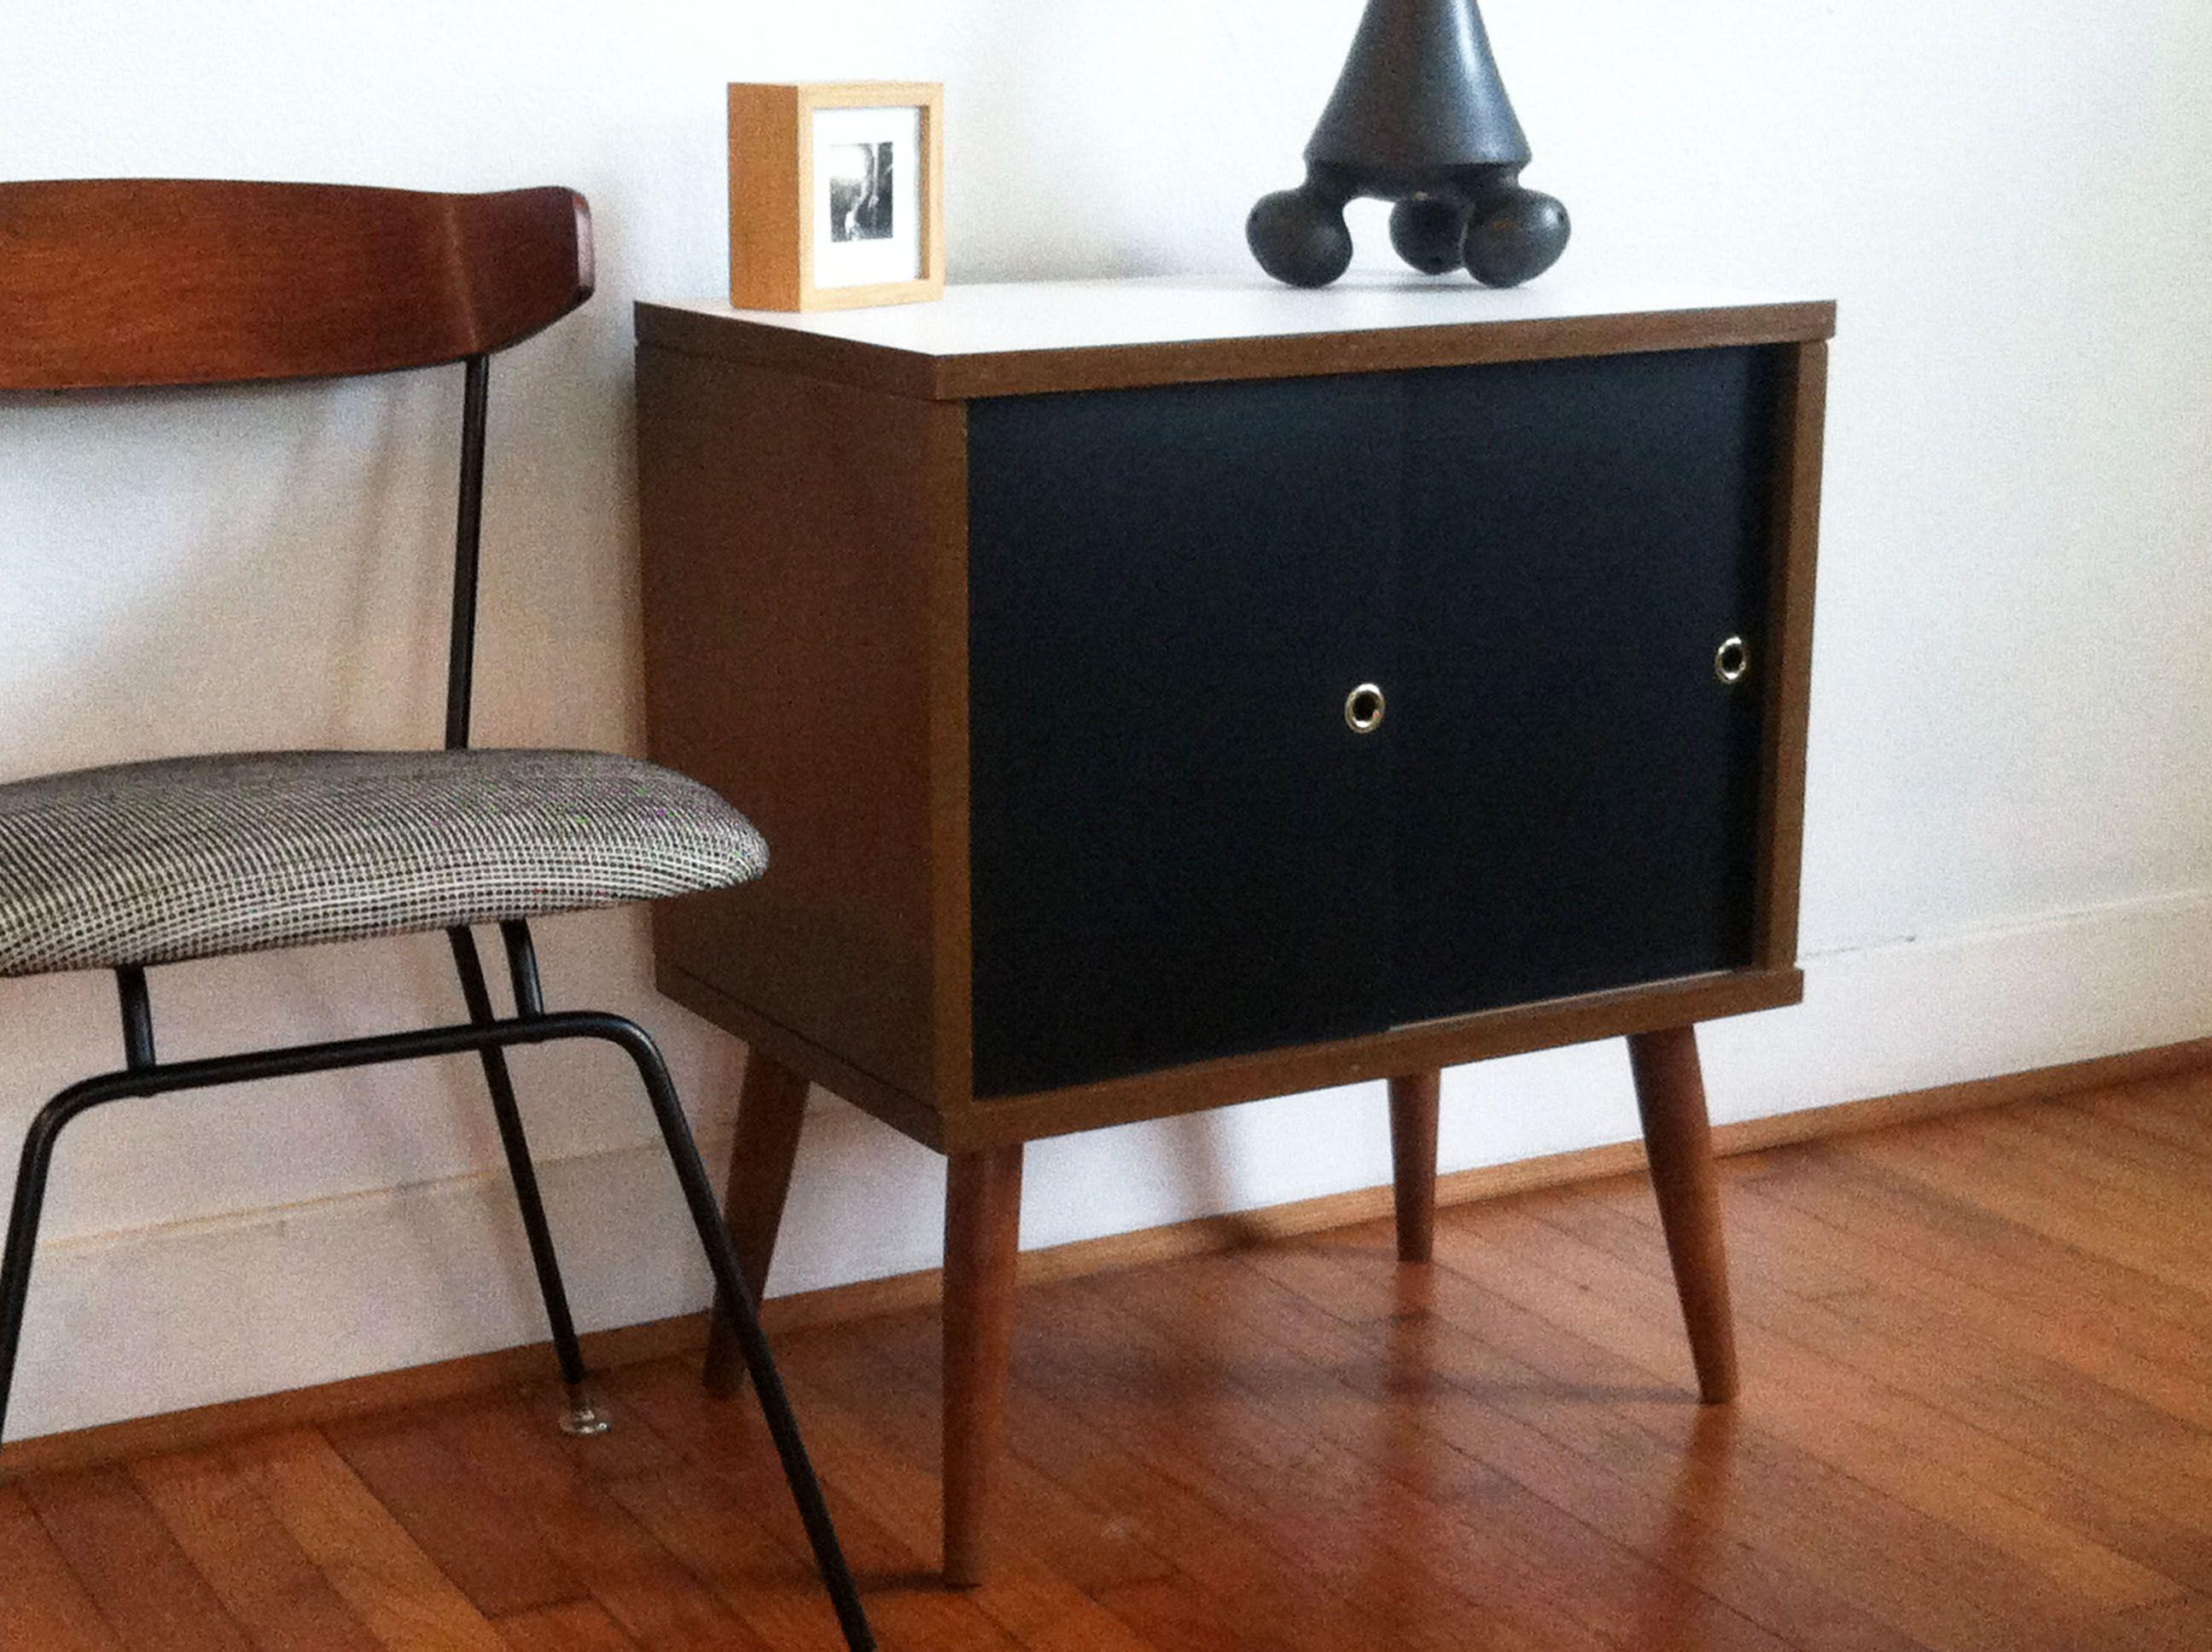 cabinets treasures cabinet miami herzog record antique musical serpentine orig of